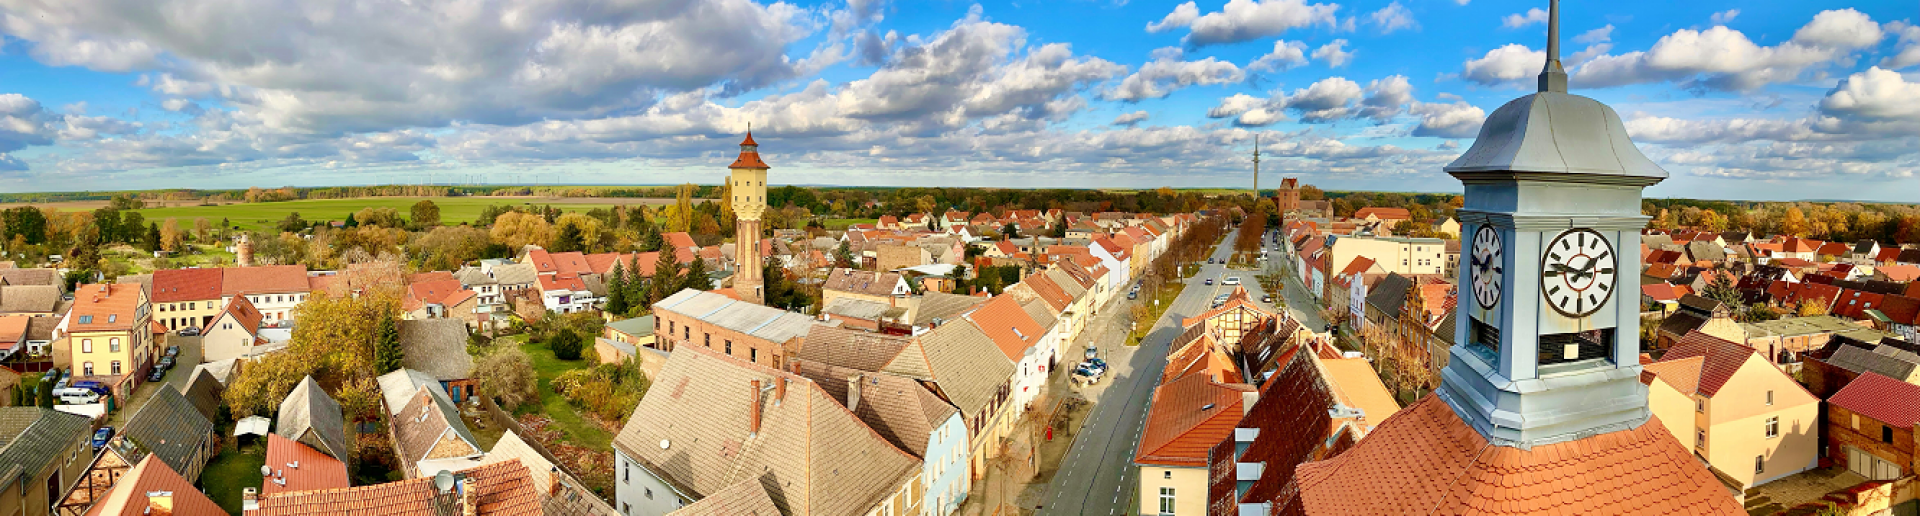 Foto: Stadtverwaltung Treuenbrietzen